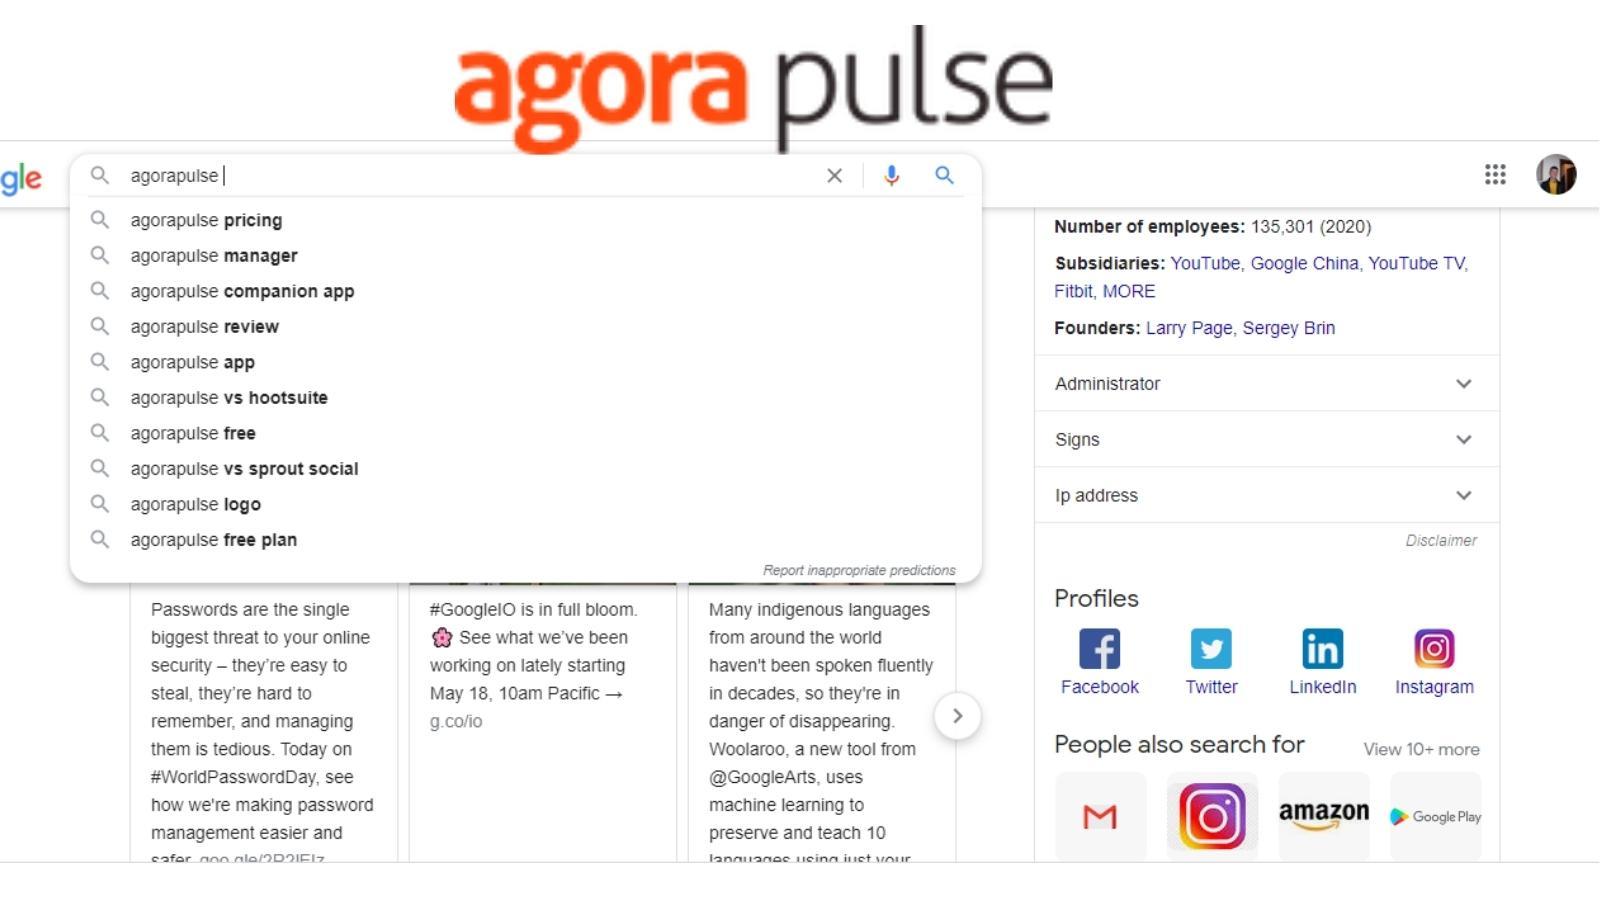 agorapulse keyword cluster